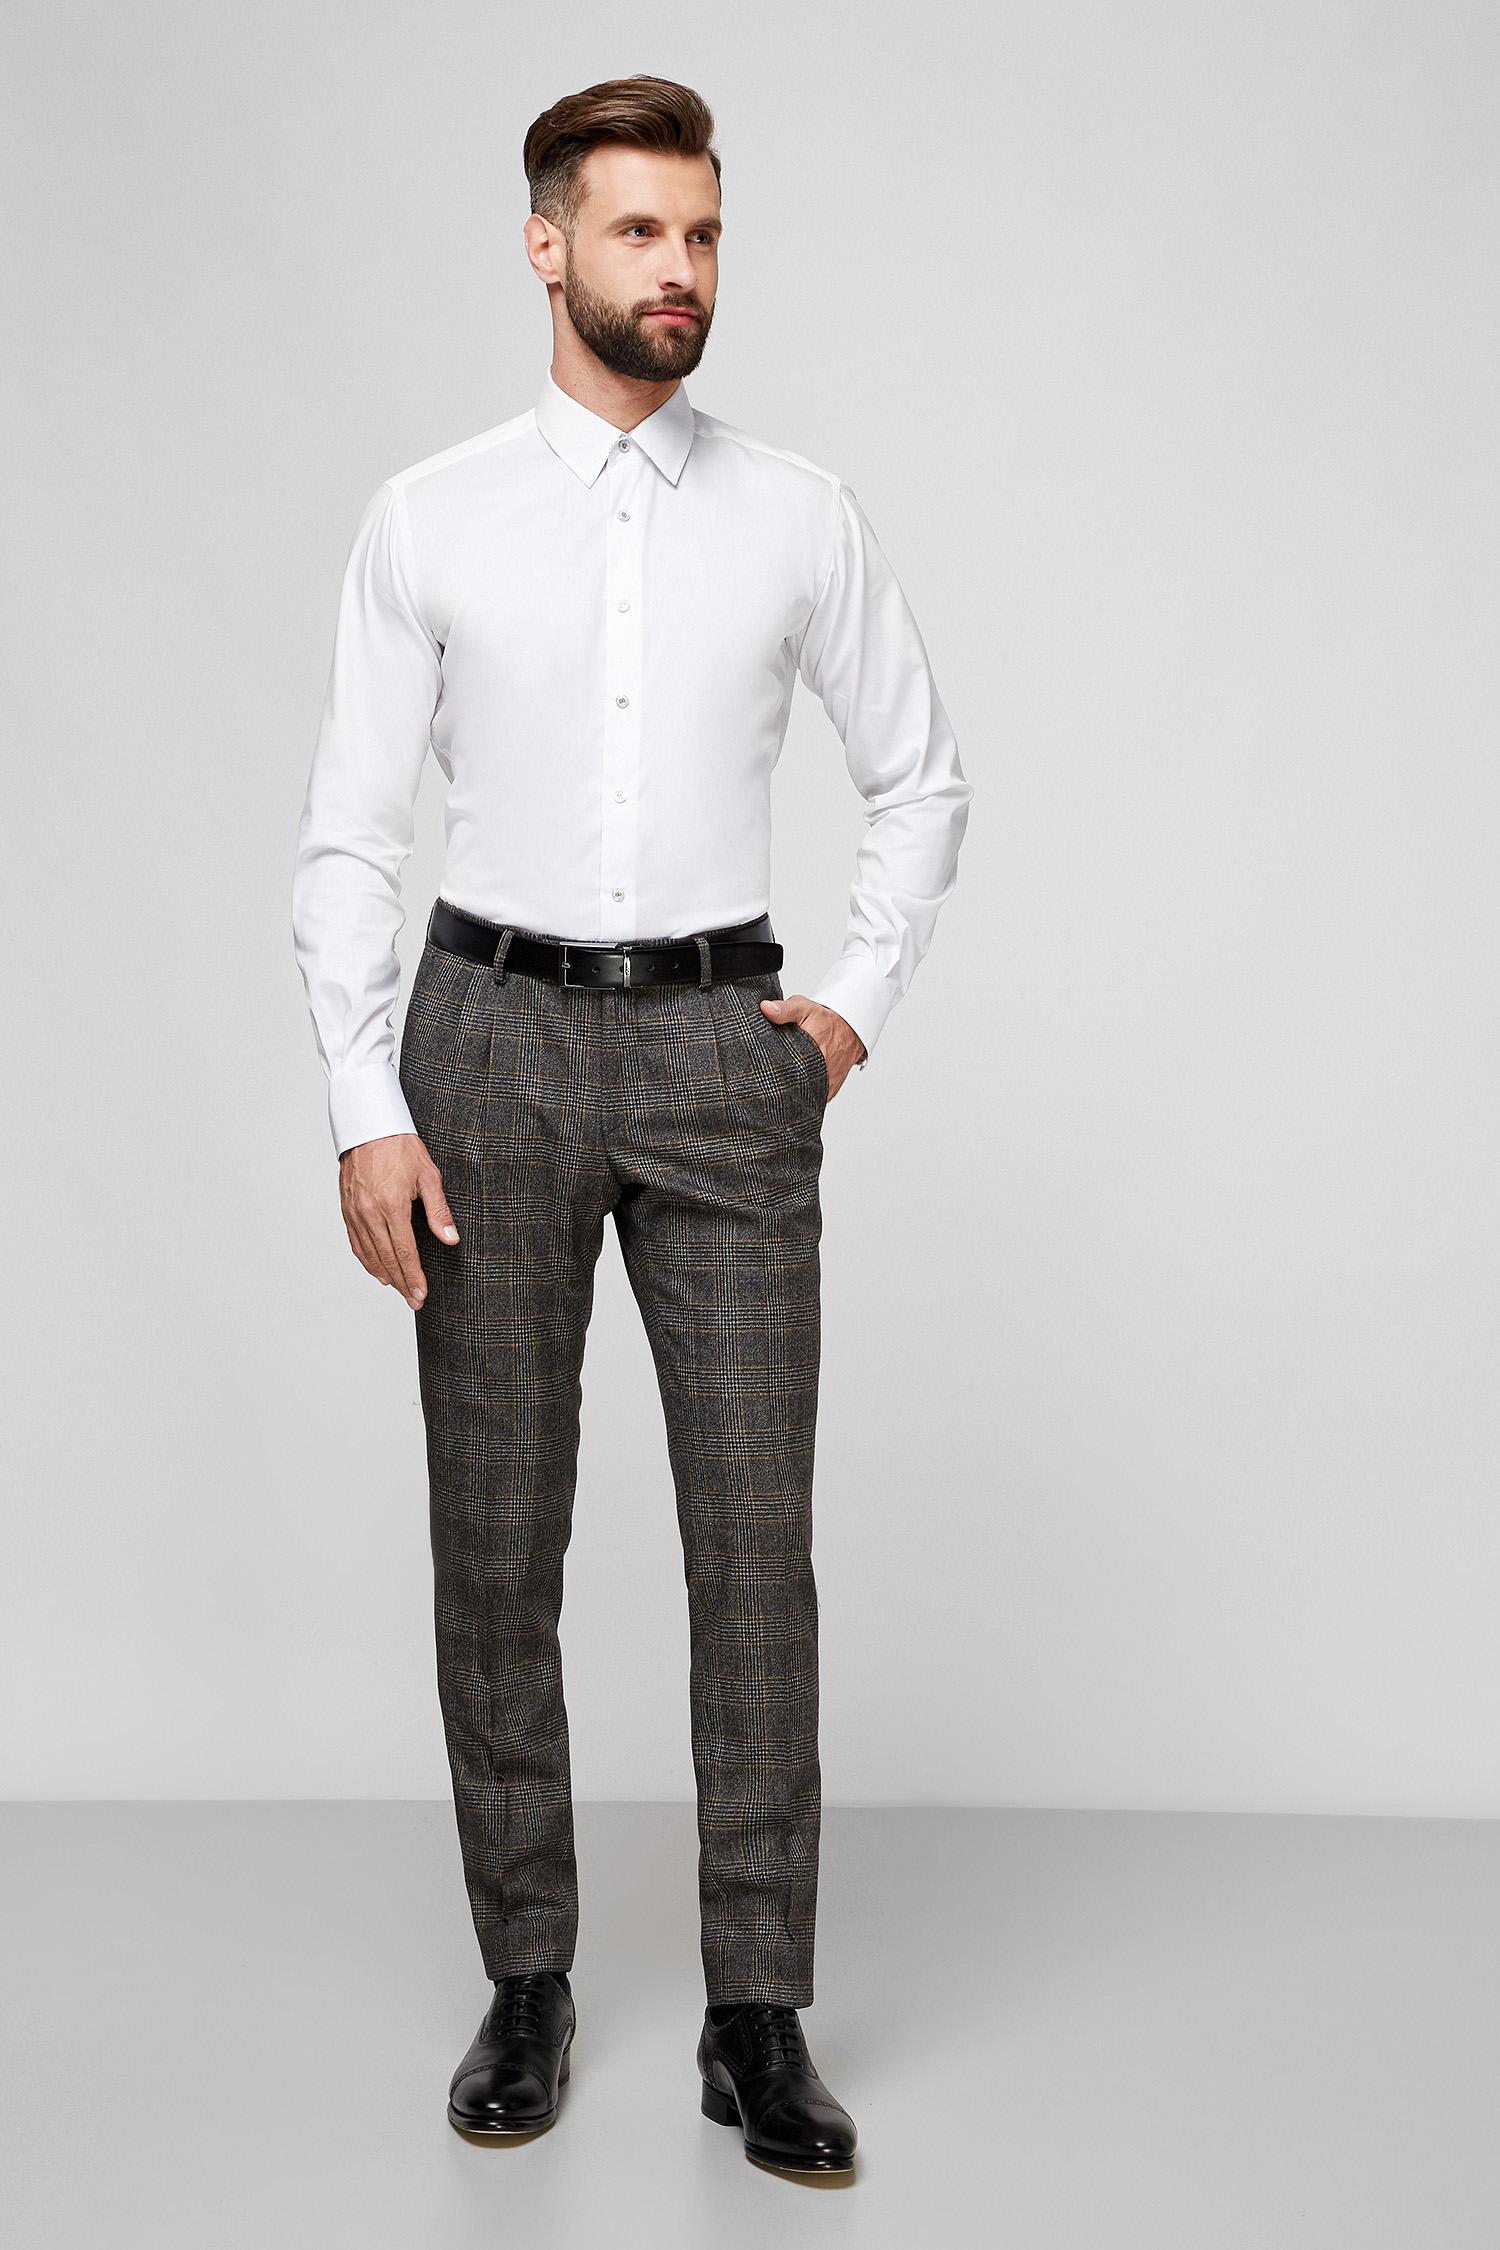 Мужские серые брюки в клетку Karl Lagerfeld 502065.255022;410